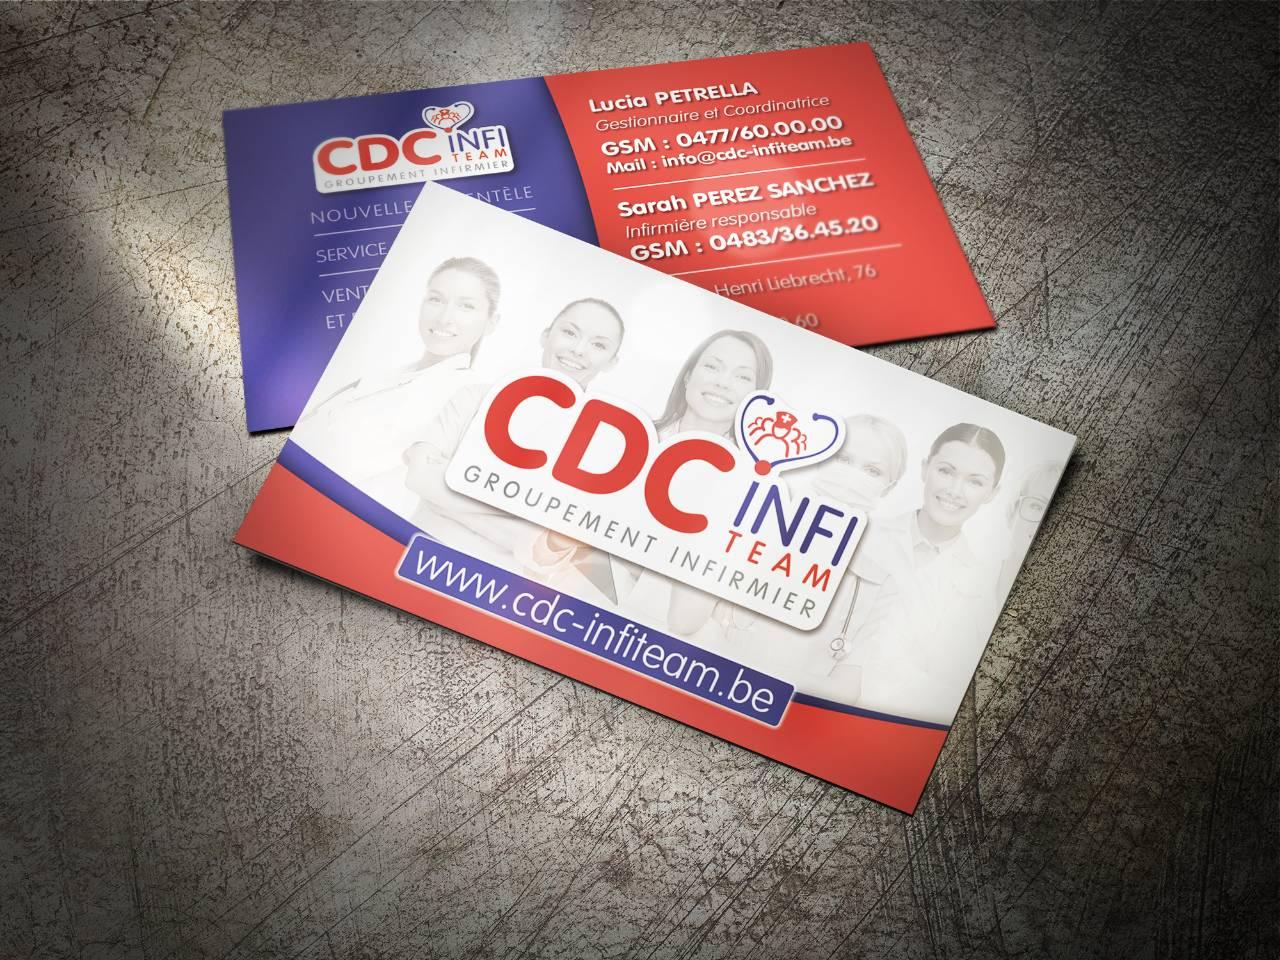 CDC Infi Cartes De Visite